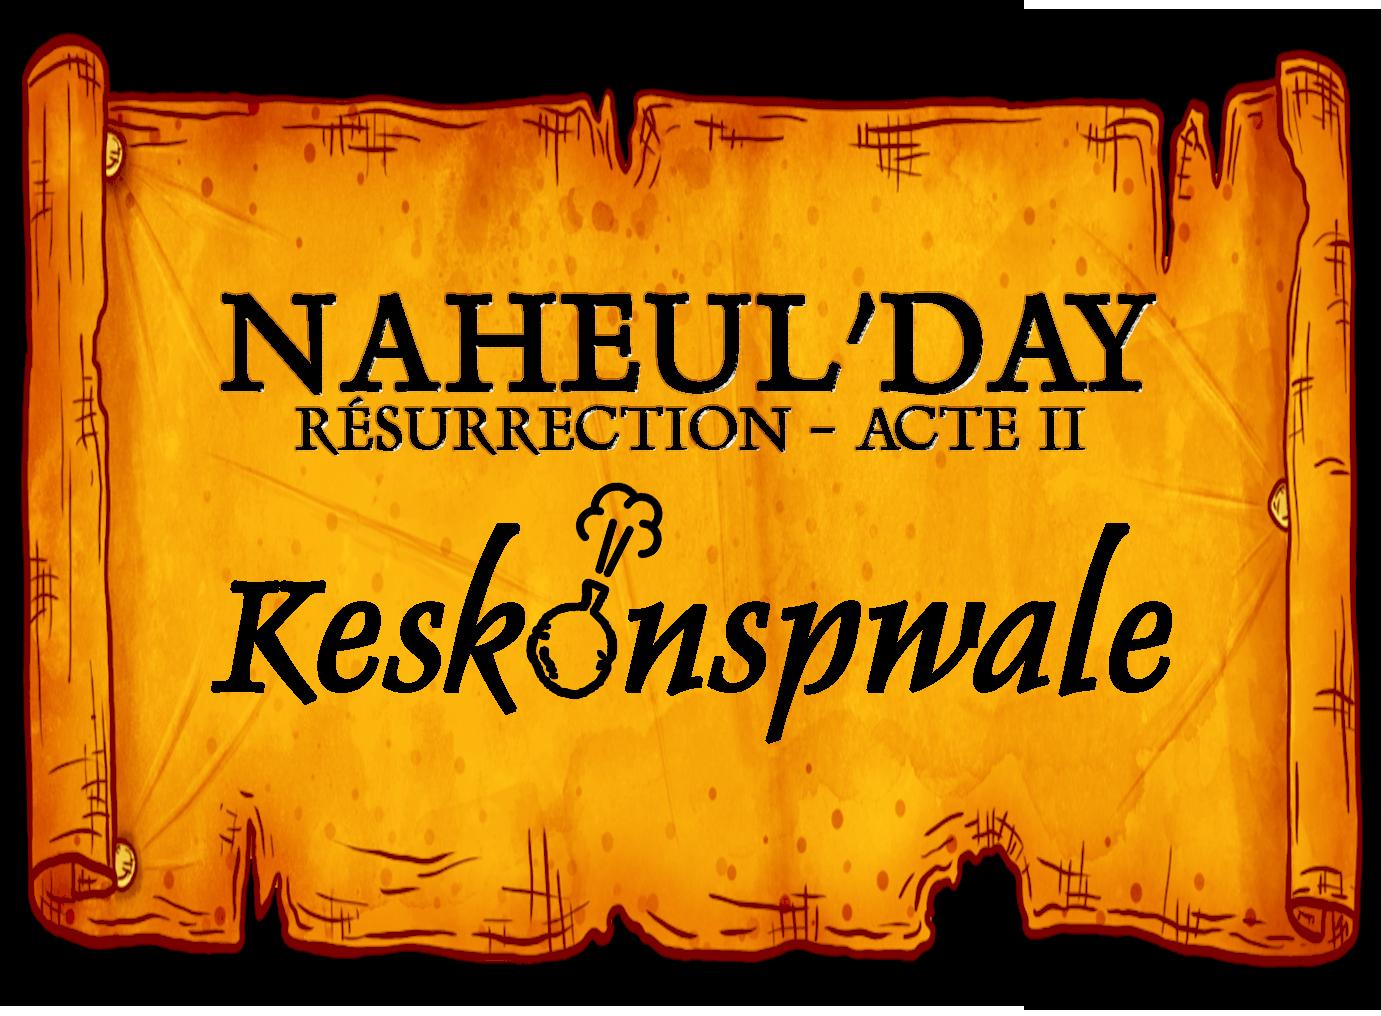 Naheul'day n°18 (1-2-3 Mai) Affiche_KeskonspwaleDay_v2